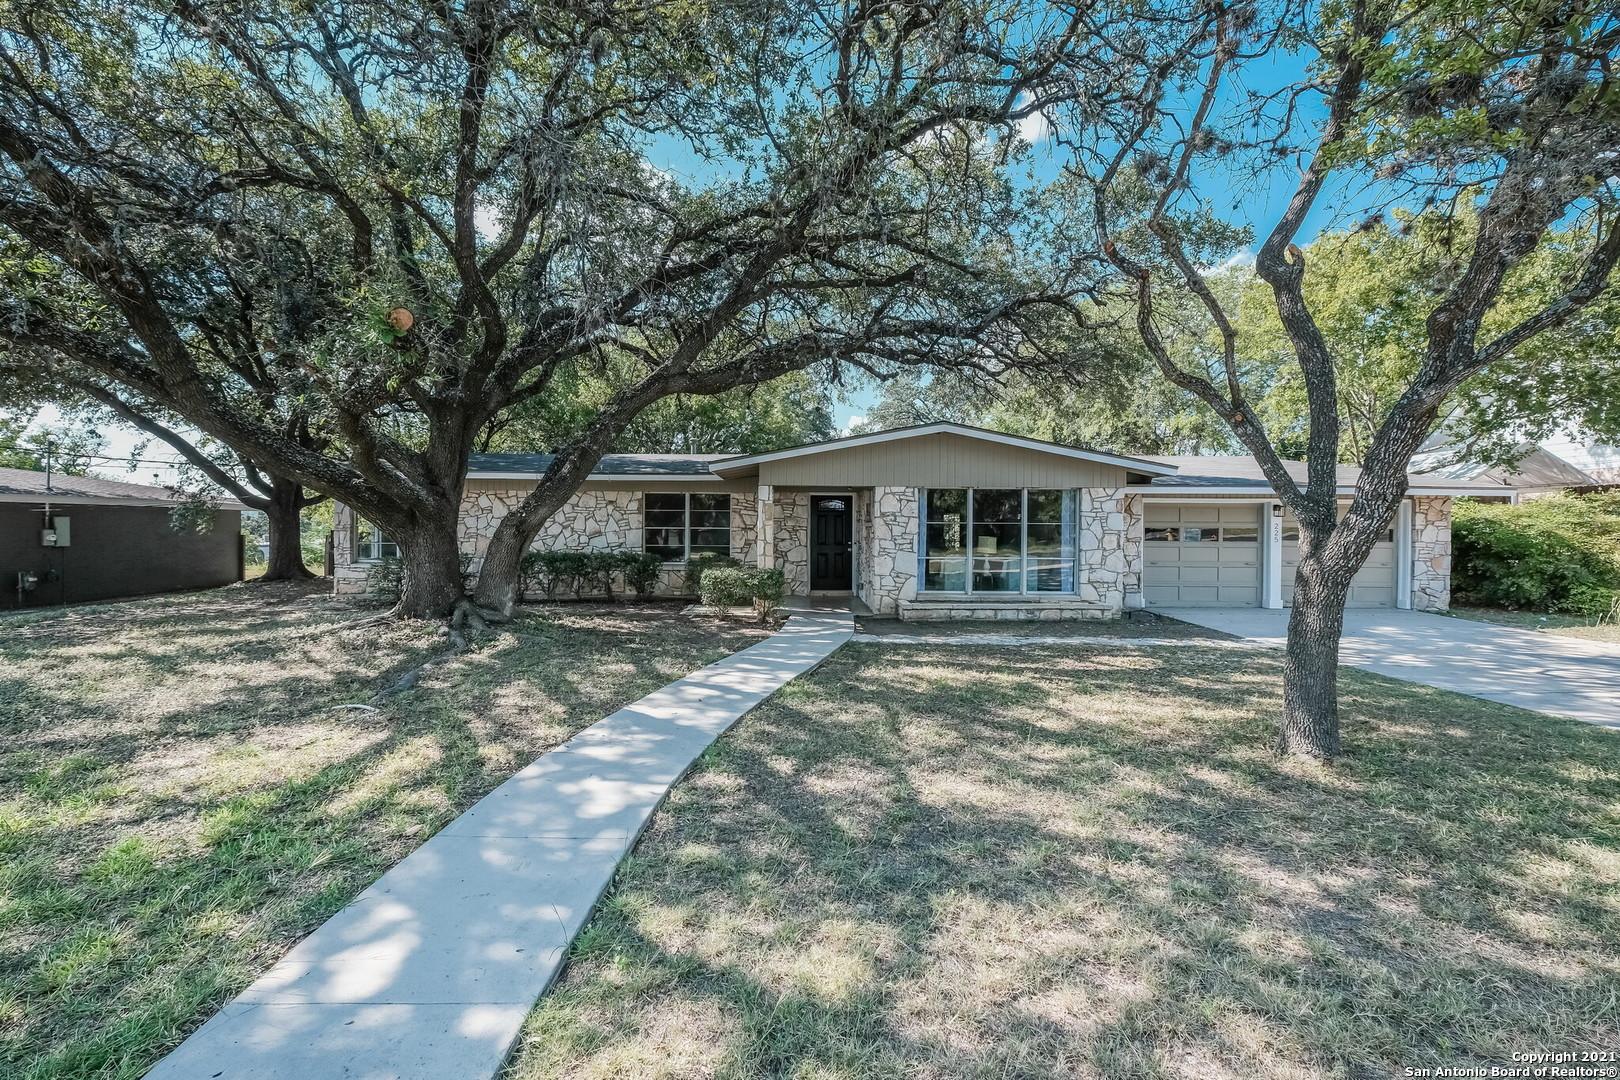 225 Herweck Dr, San Antonio, TX 78213